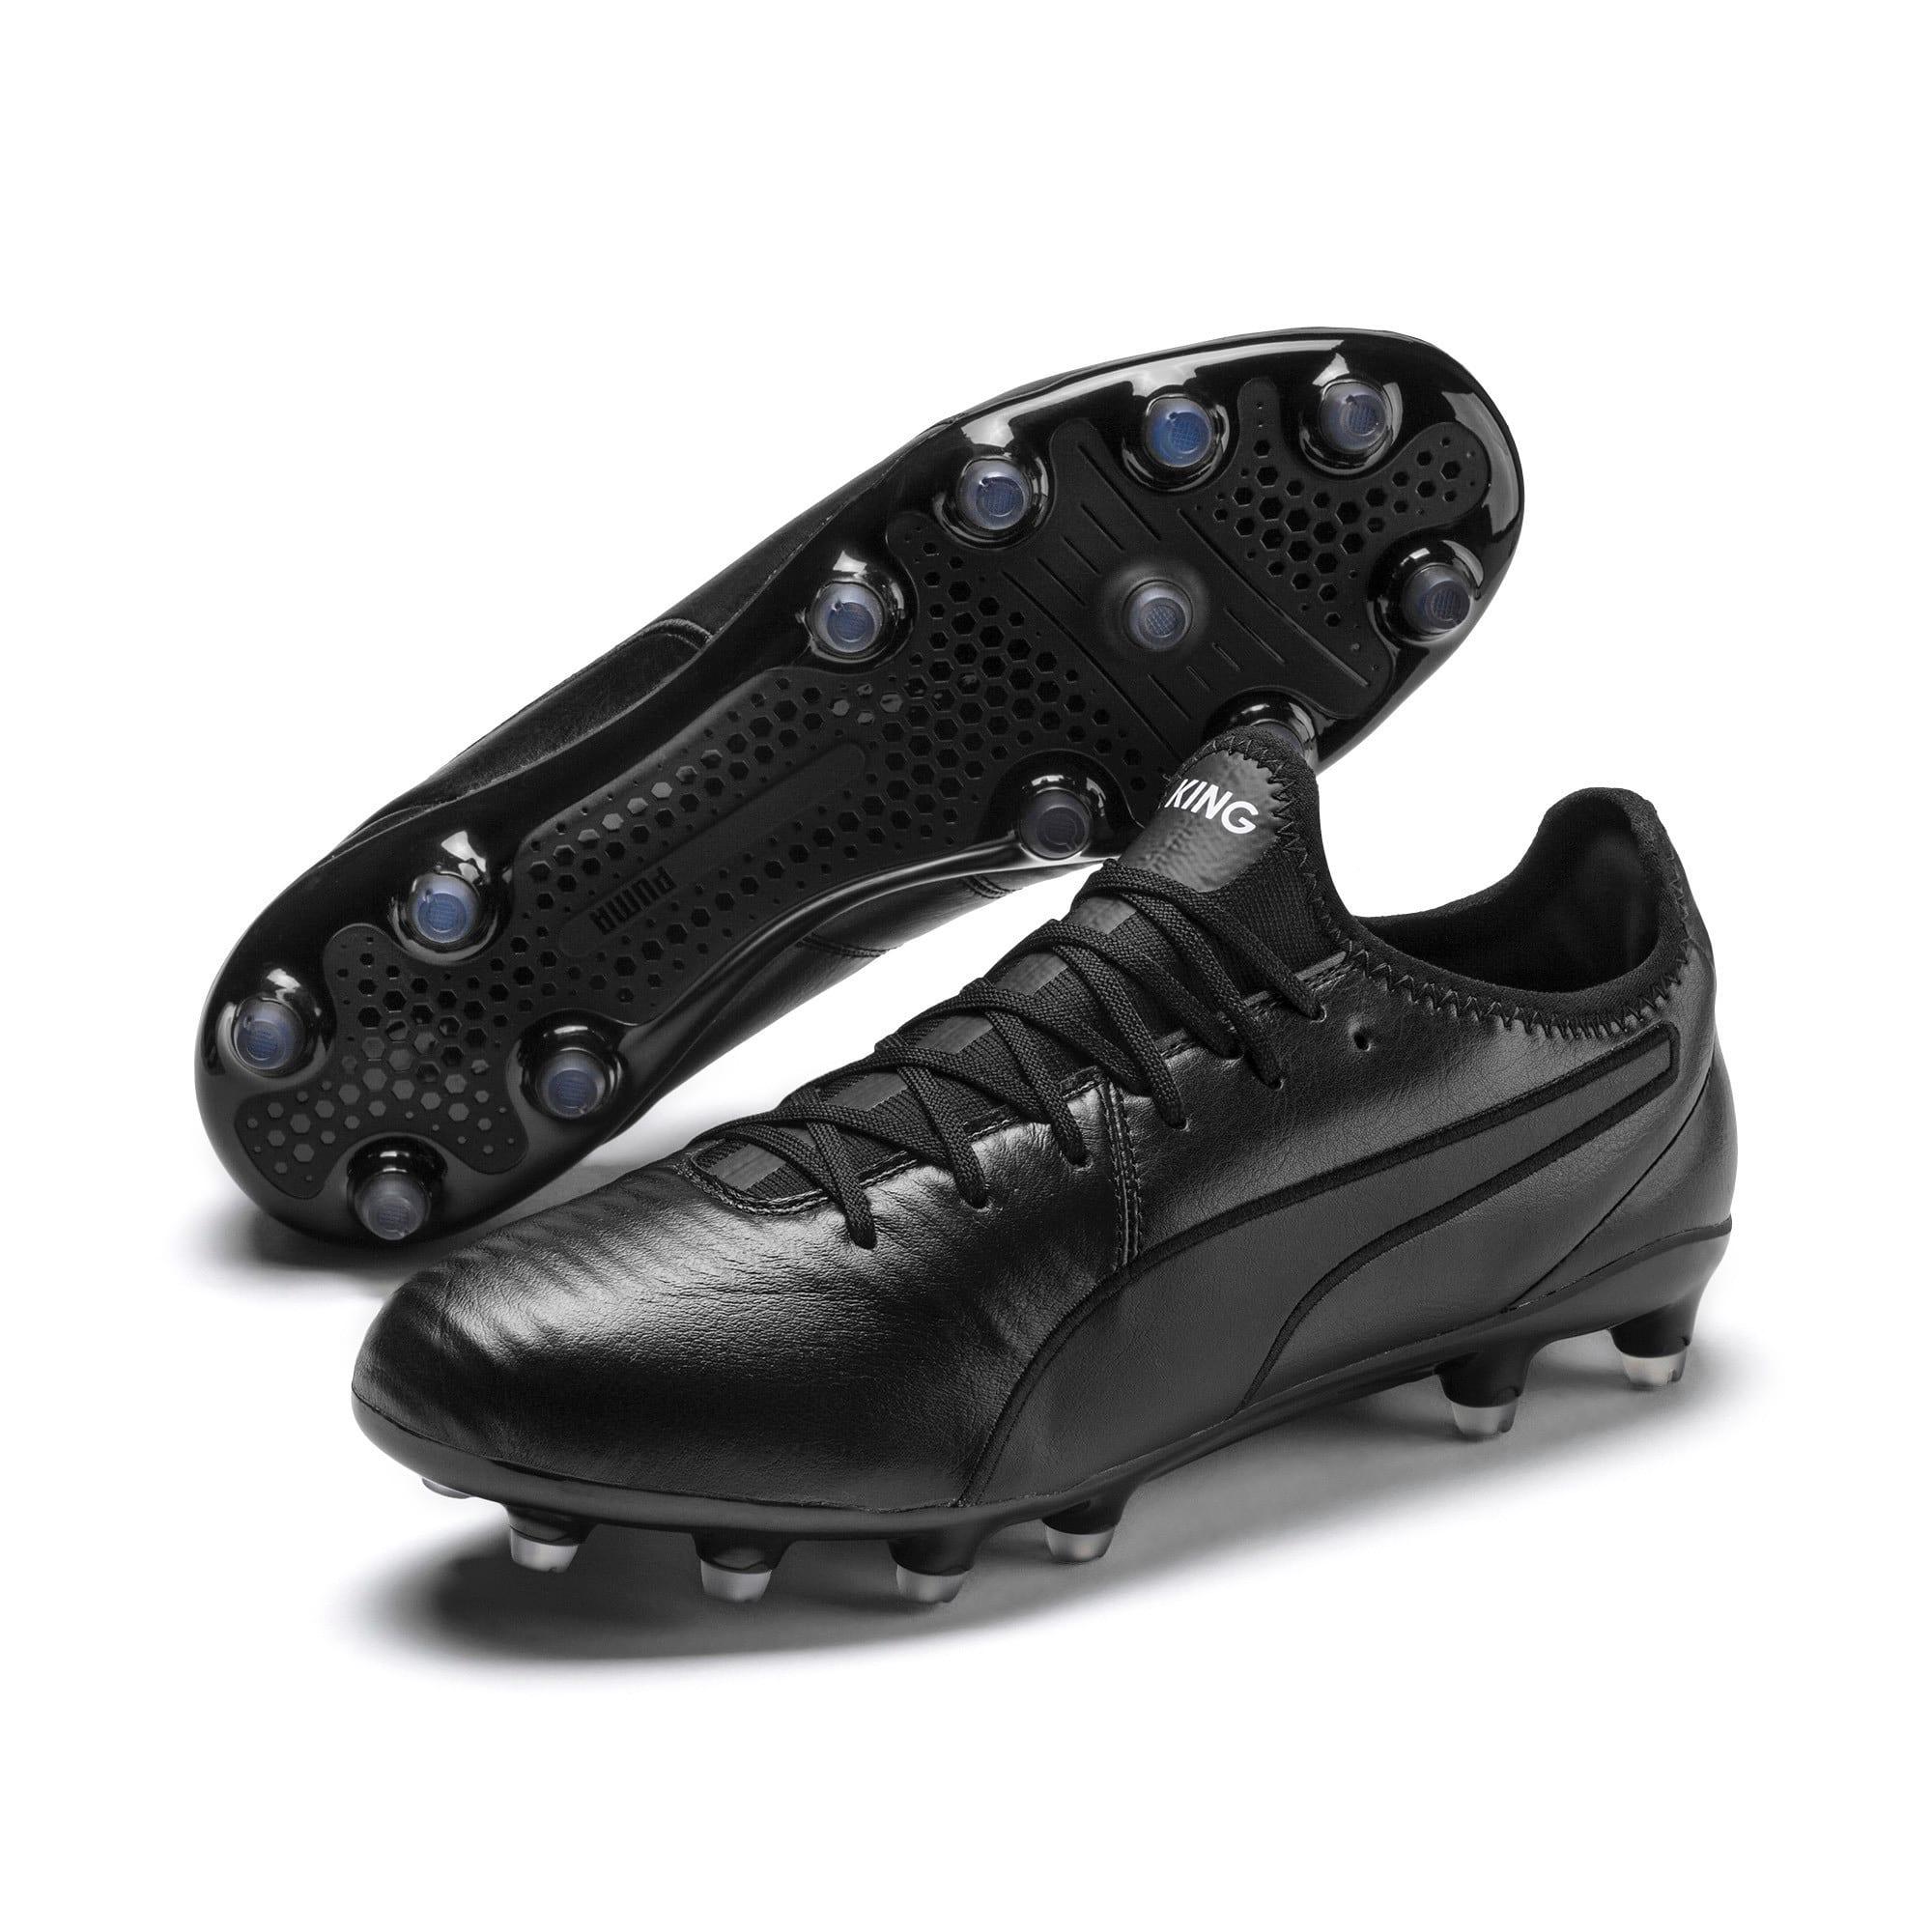 Thumbnail 3 of King Pro FG Soccer Cleats, Puma Black-Puma White, medium